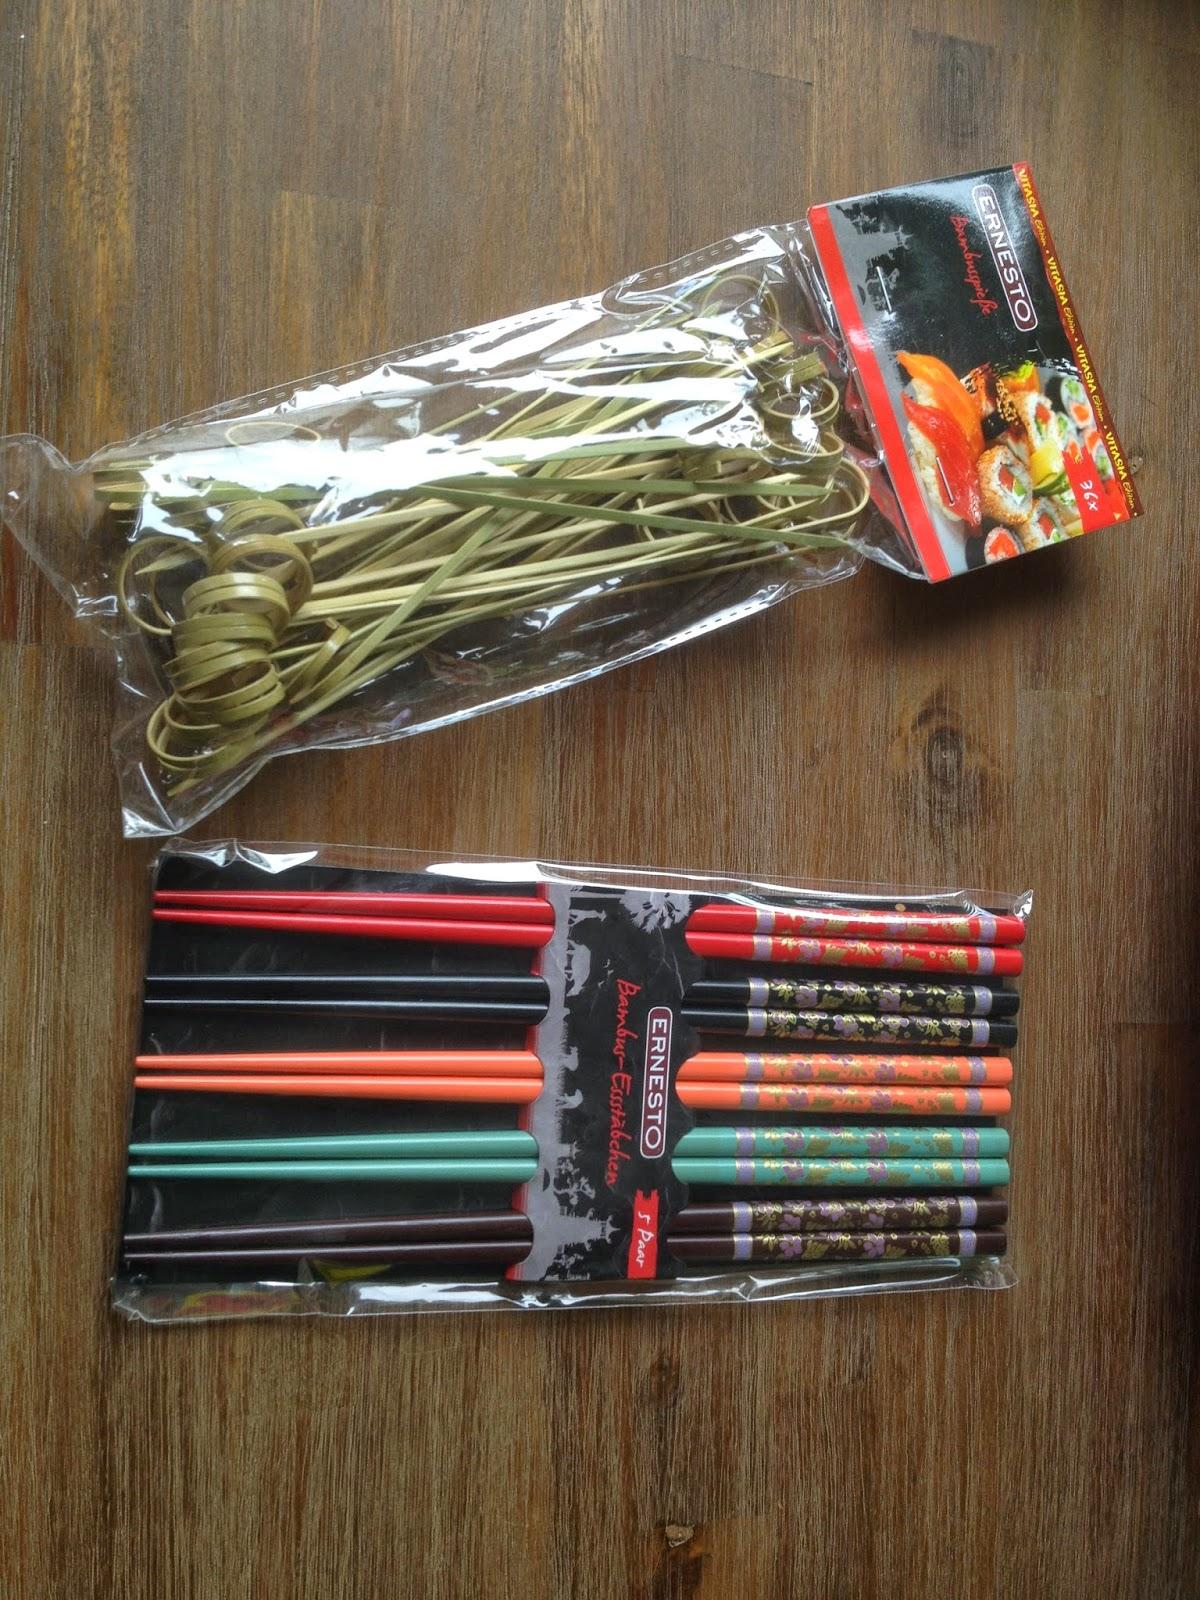 Eetstokjes en bamboespiesjes